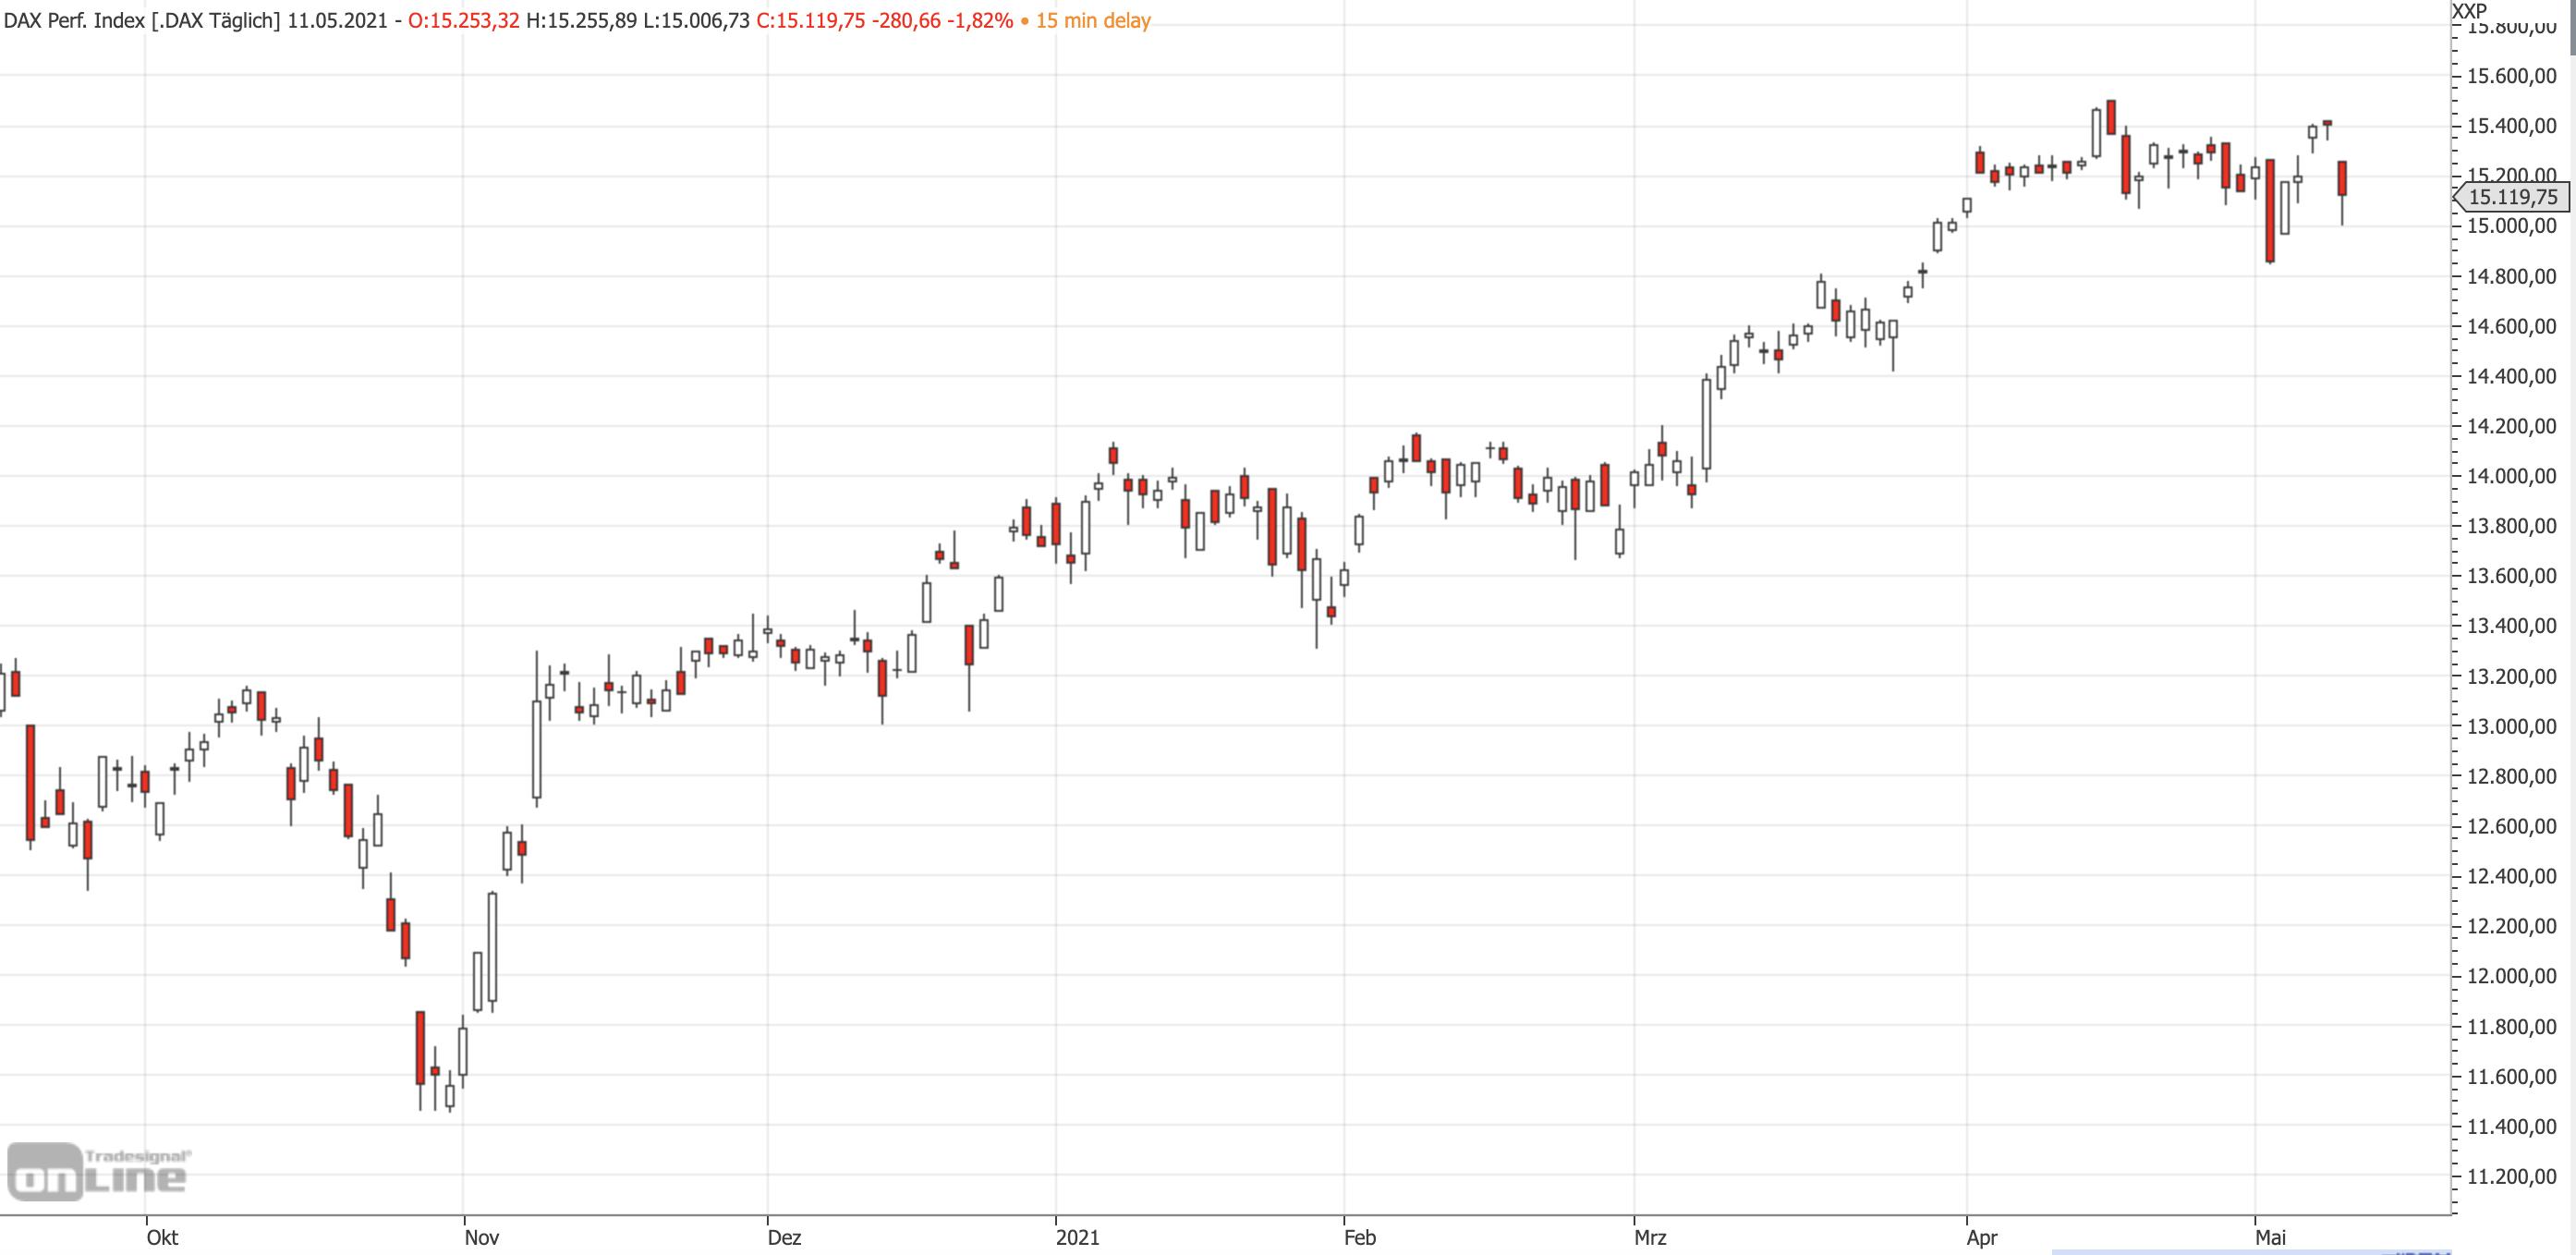 Mittelfristiger DAX-Chart am 11.05.2021